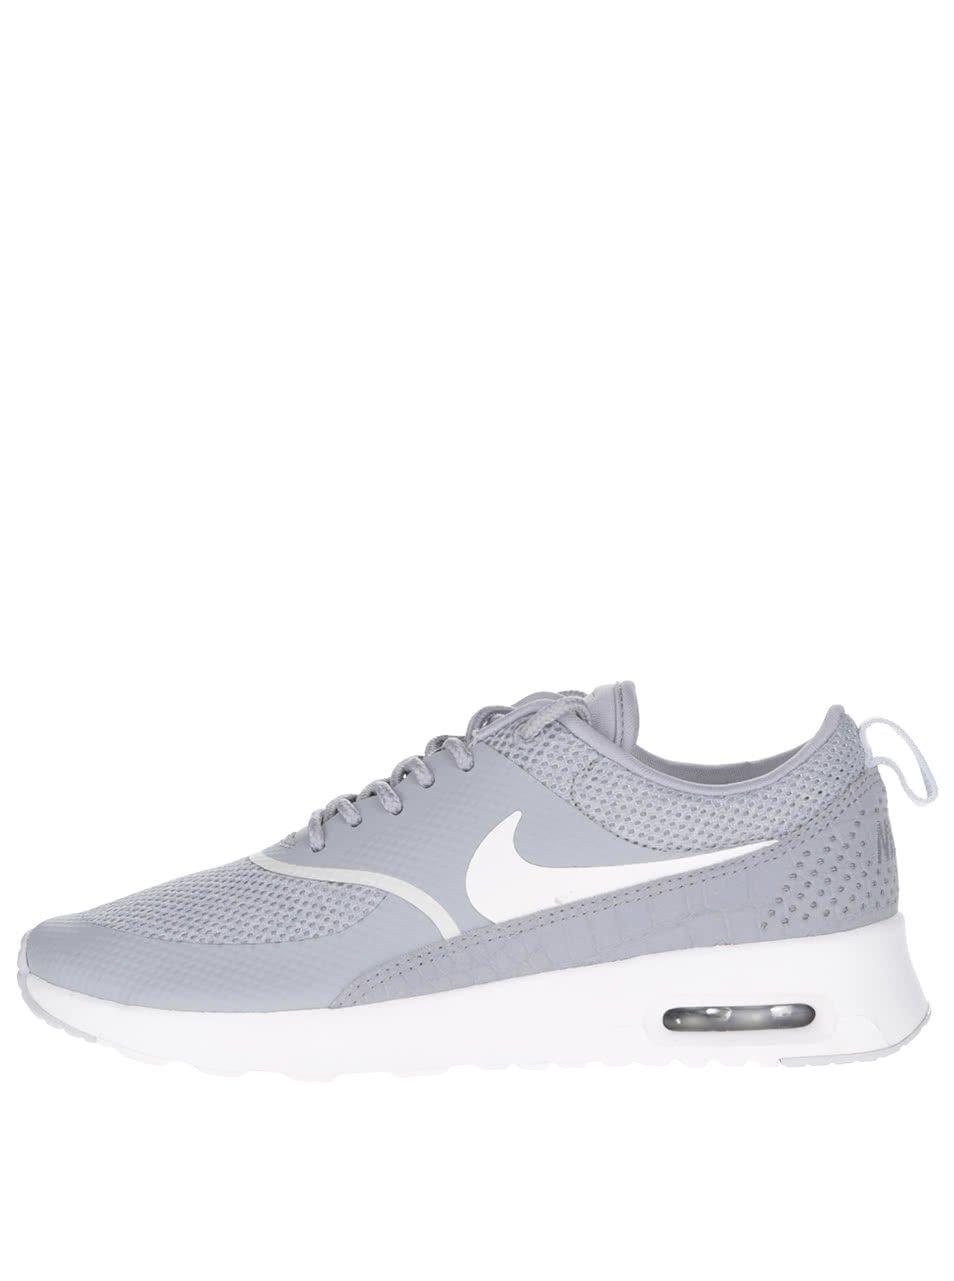 Světle šedé dámské tenisky Nike Air Max Thea